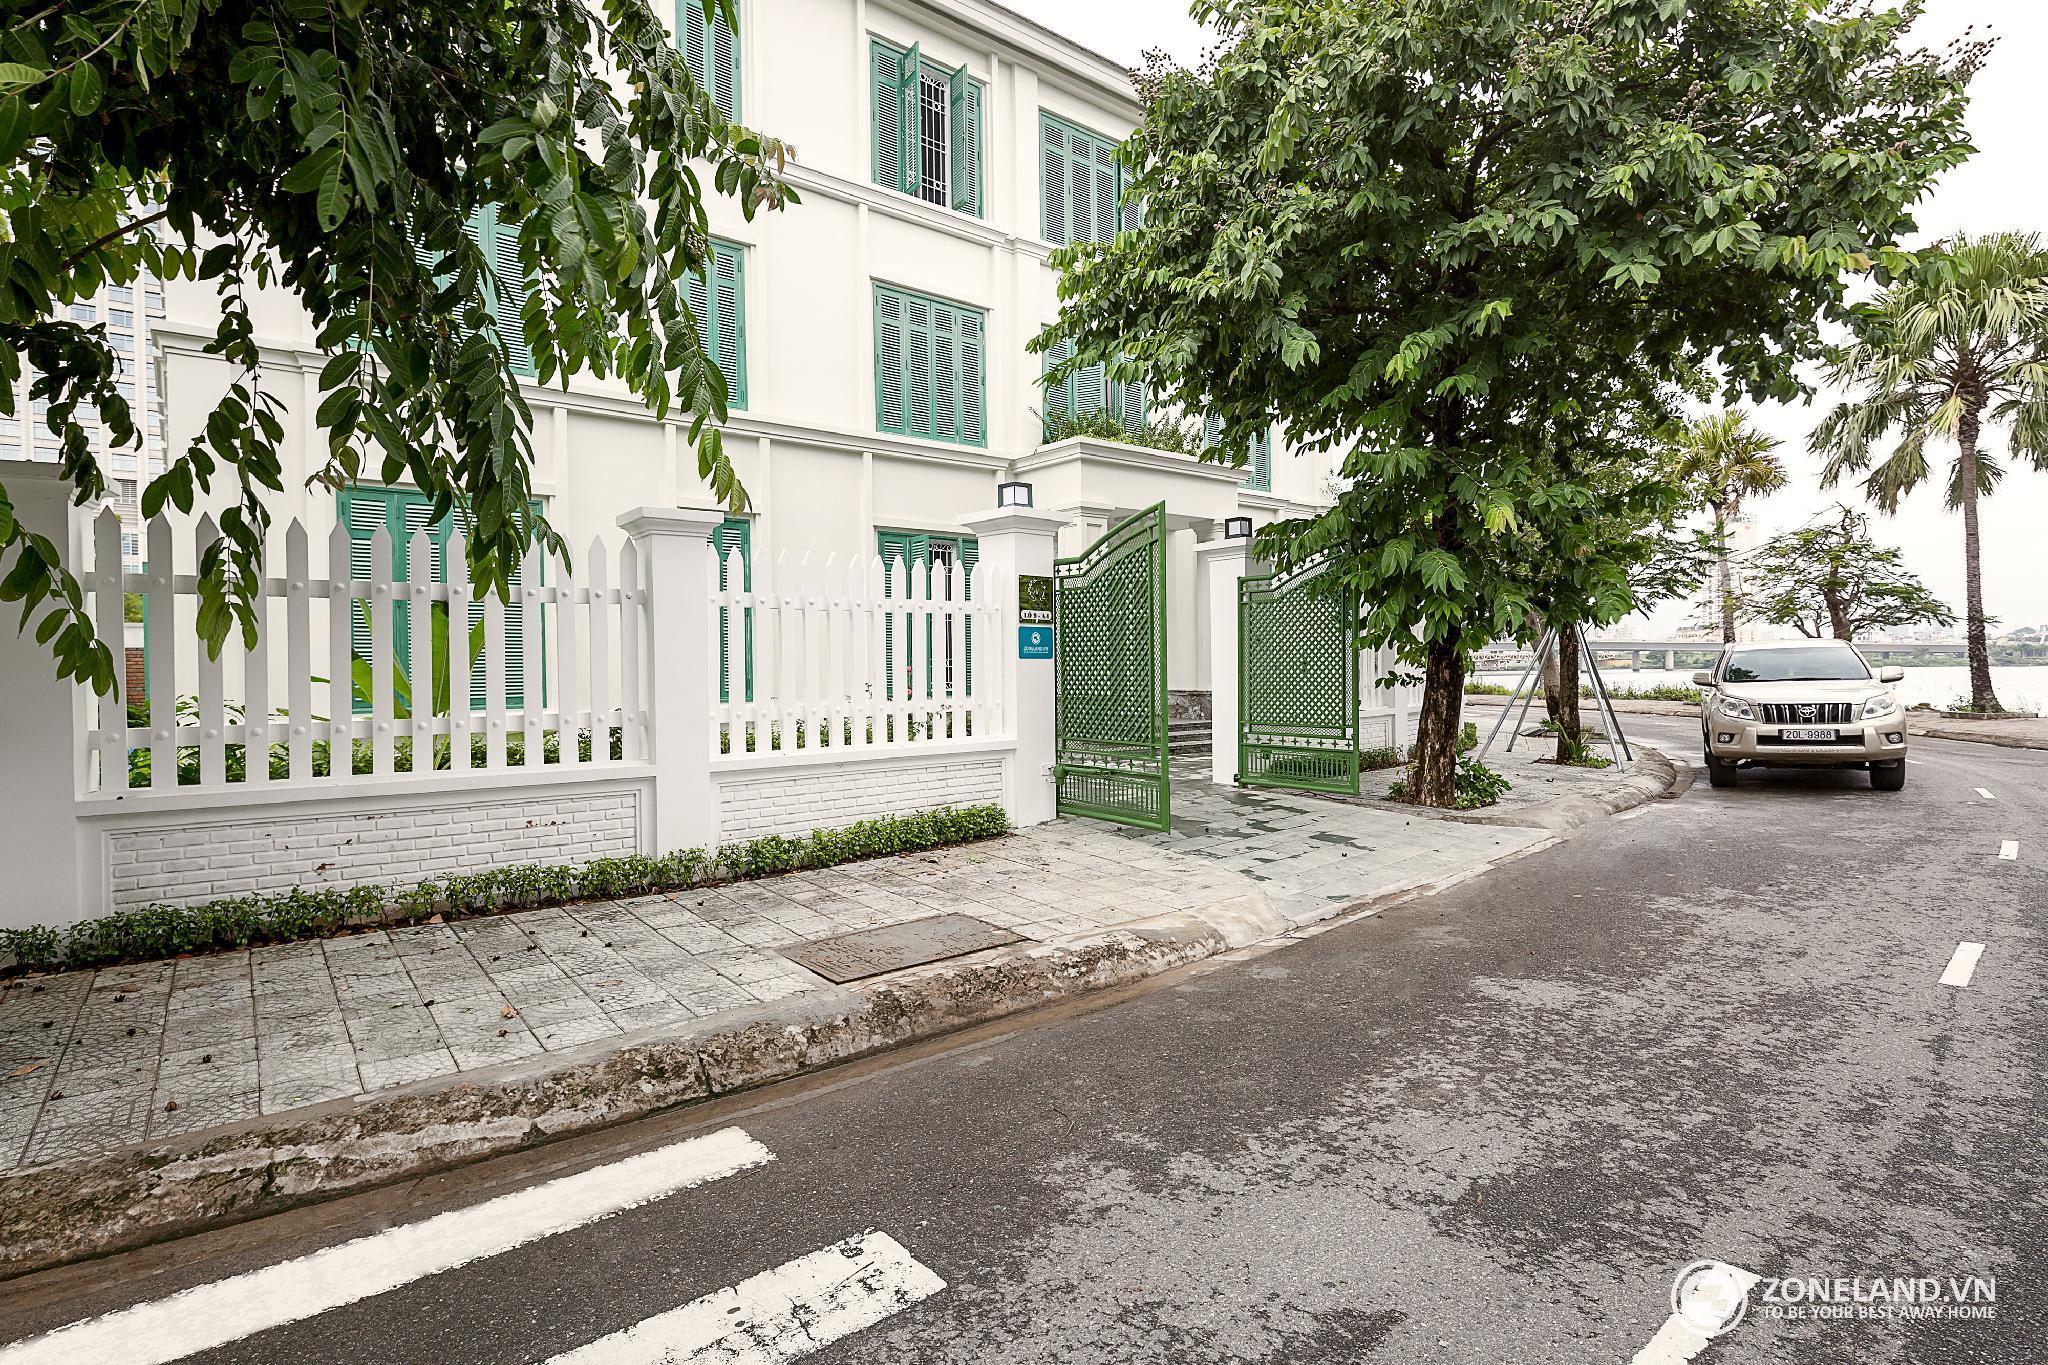 Salalem Zoneland Apartment In Great Green Island